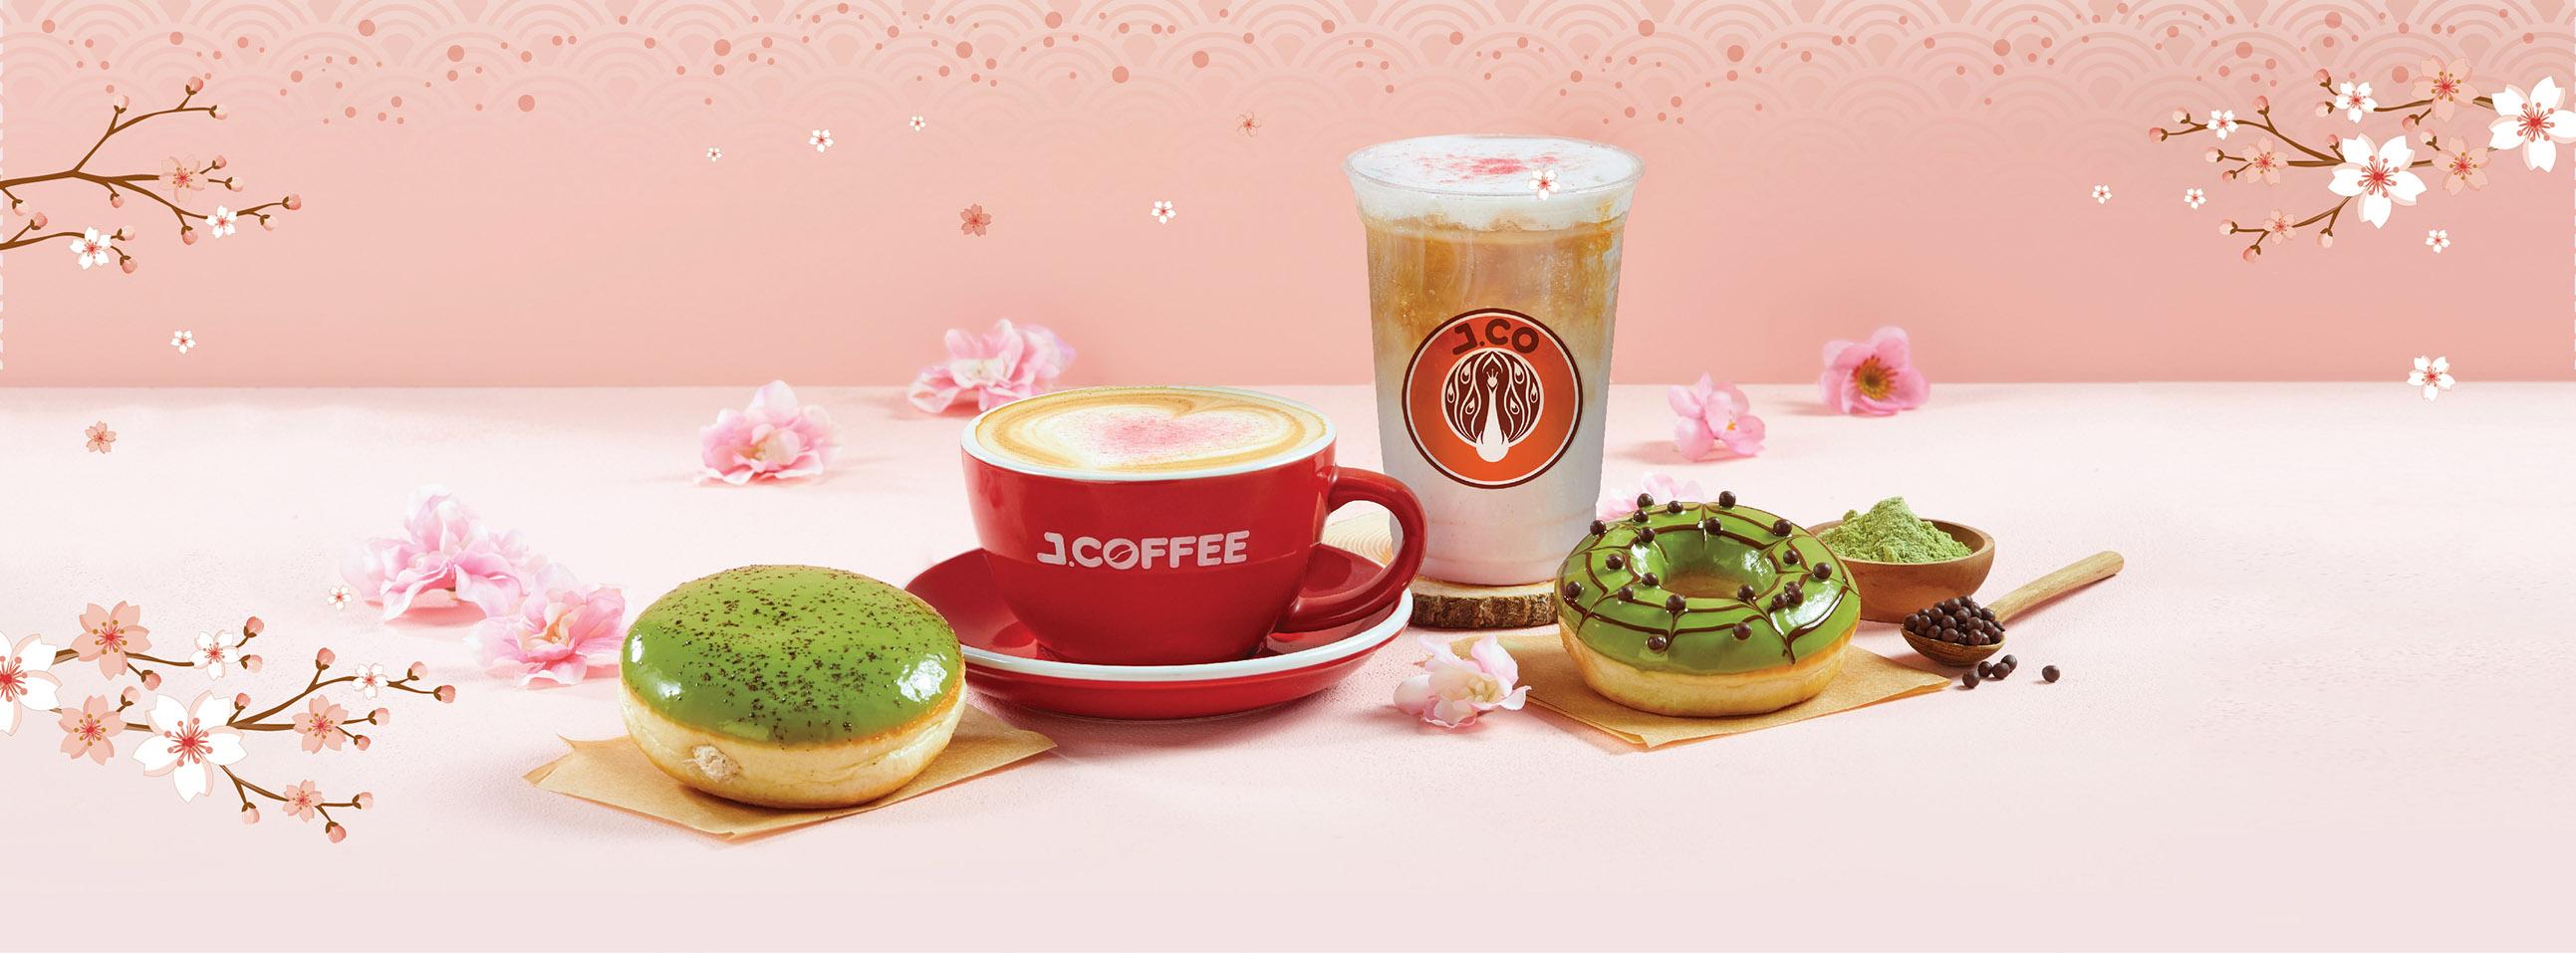 Home - J CO Indonesia: The Best Donuts, Coffee, Yogurt